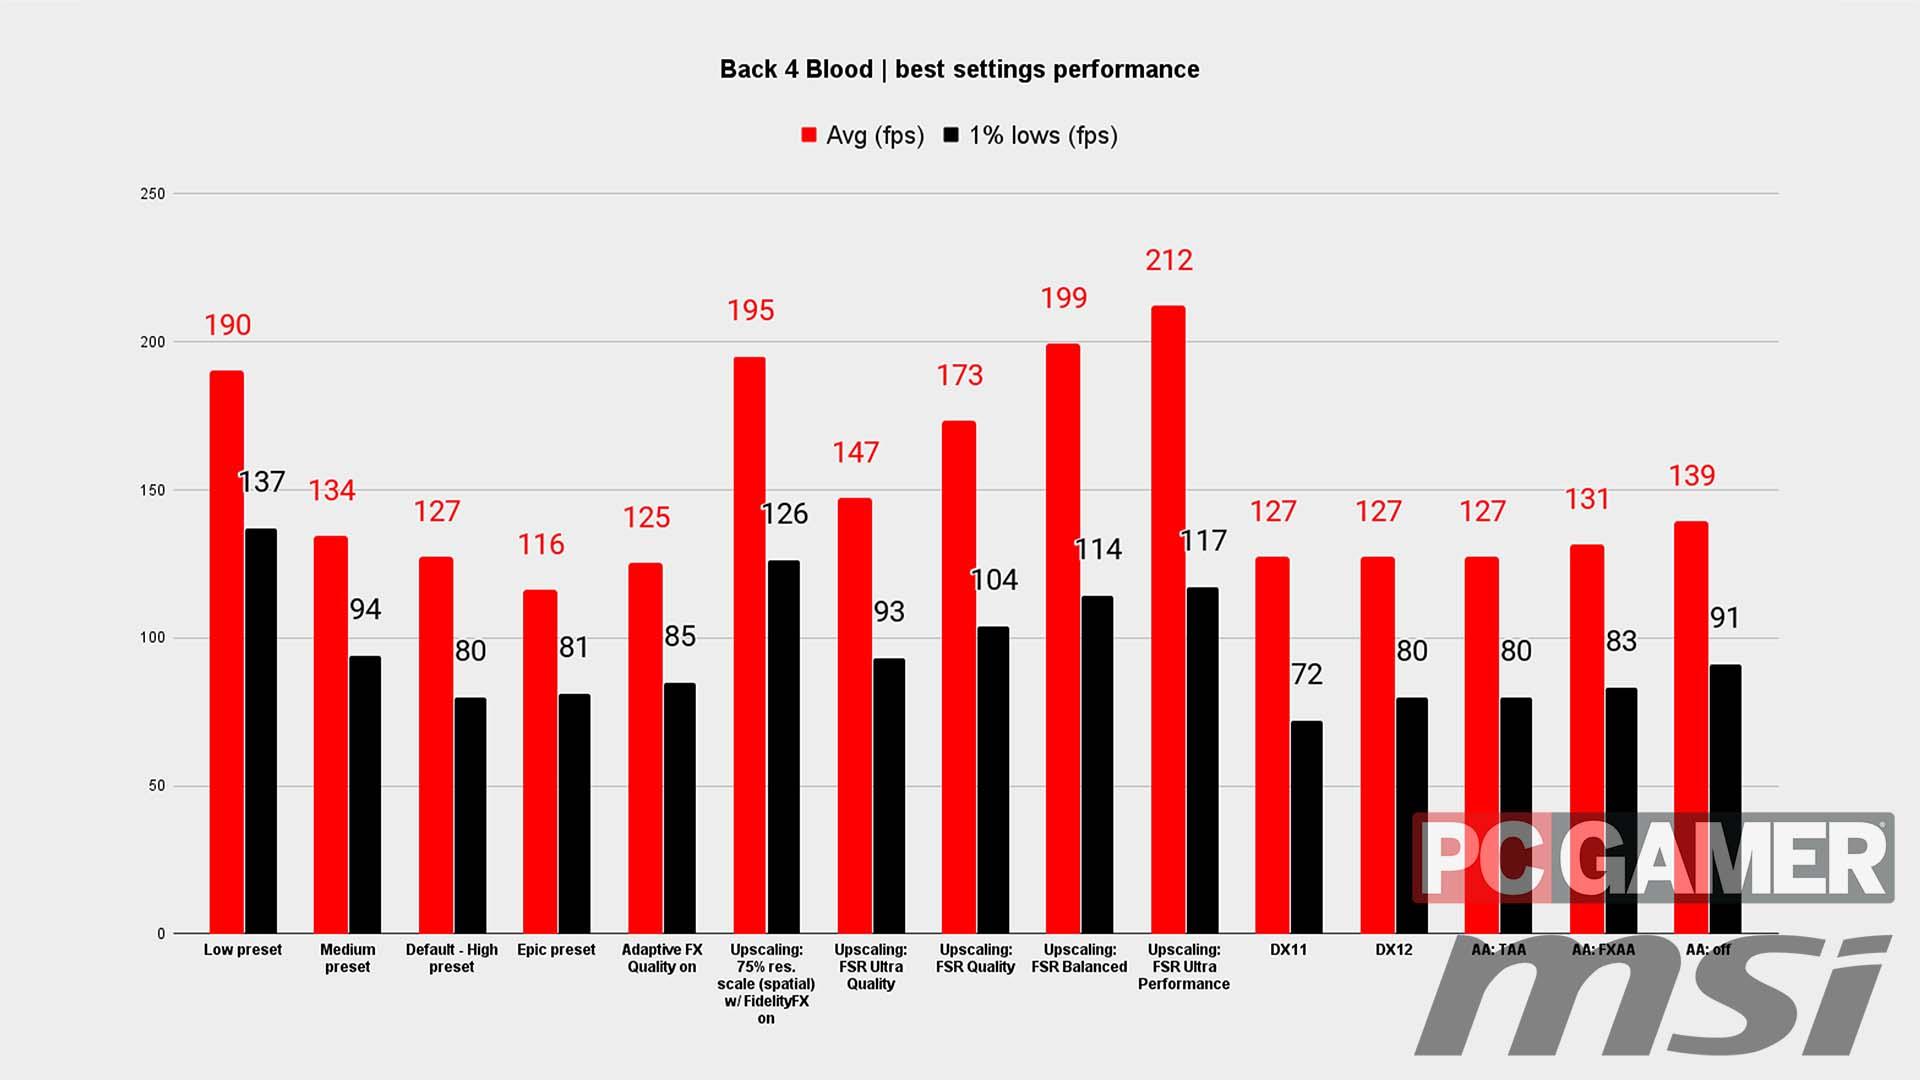 Back 4 Blood best settings performance chart